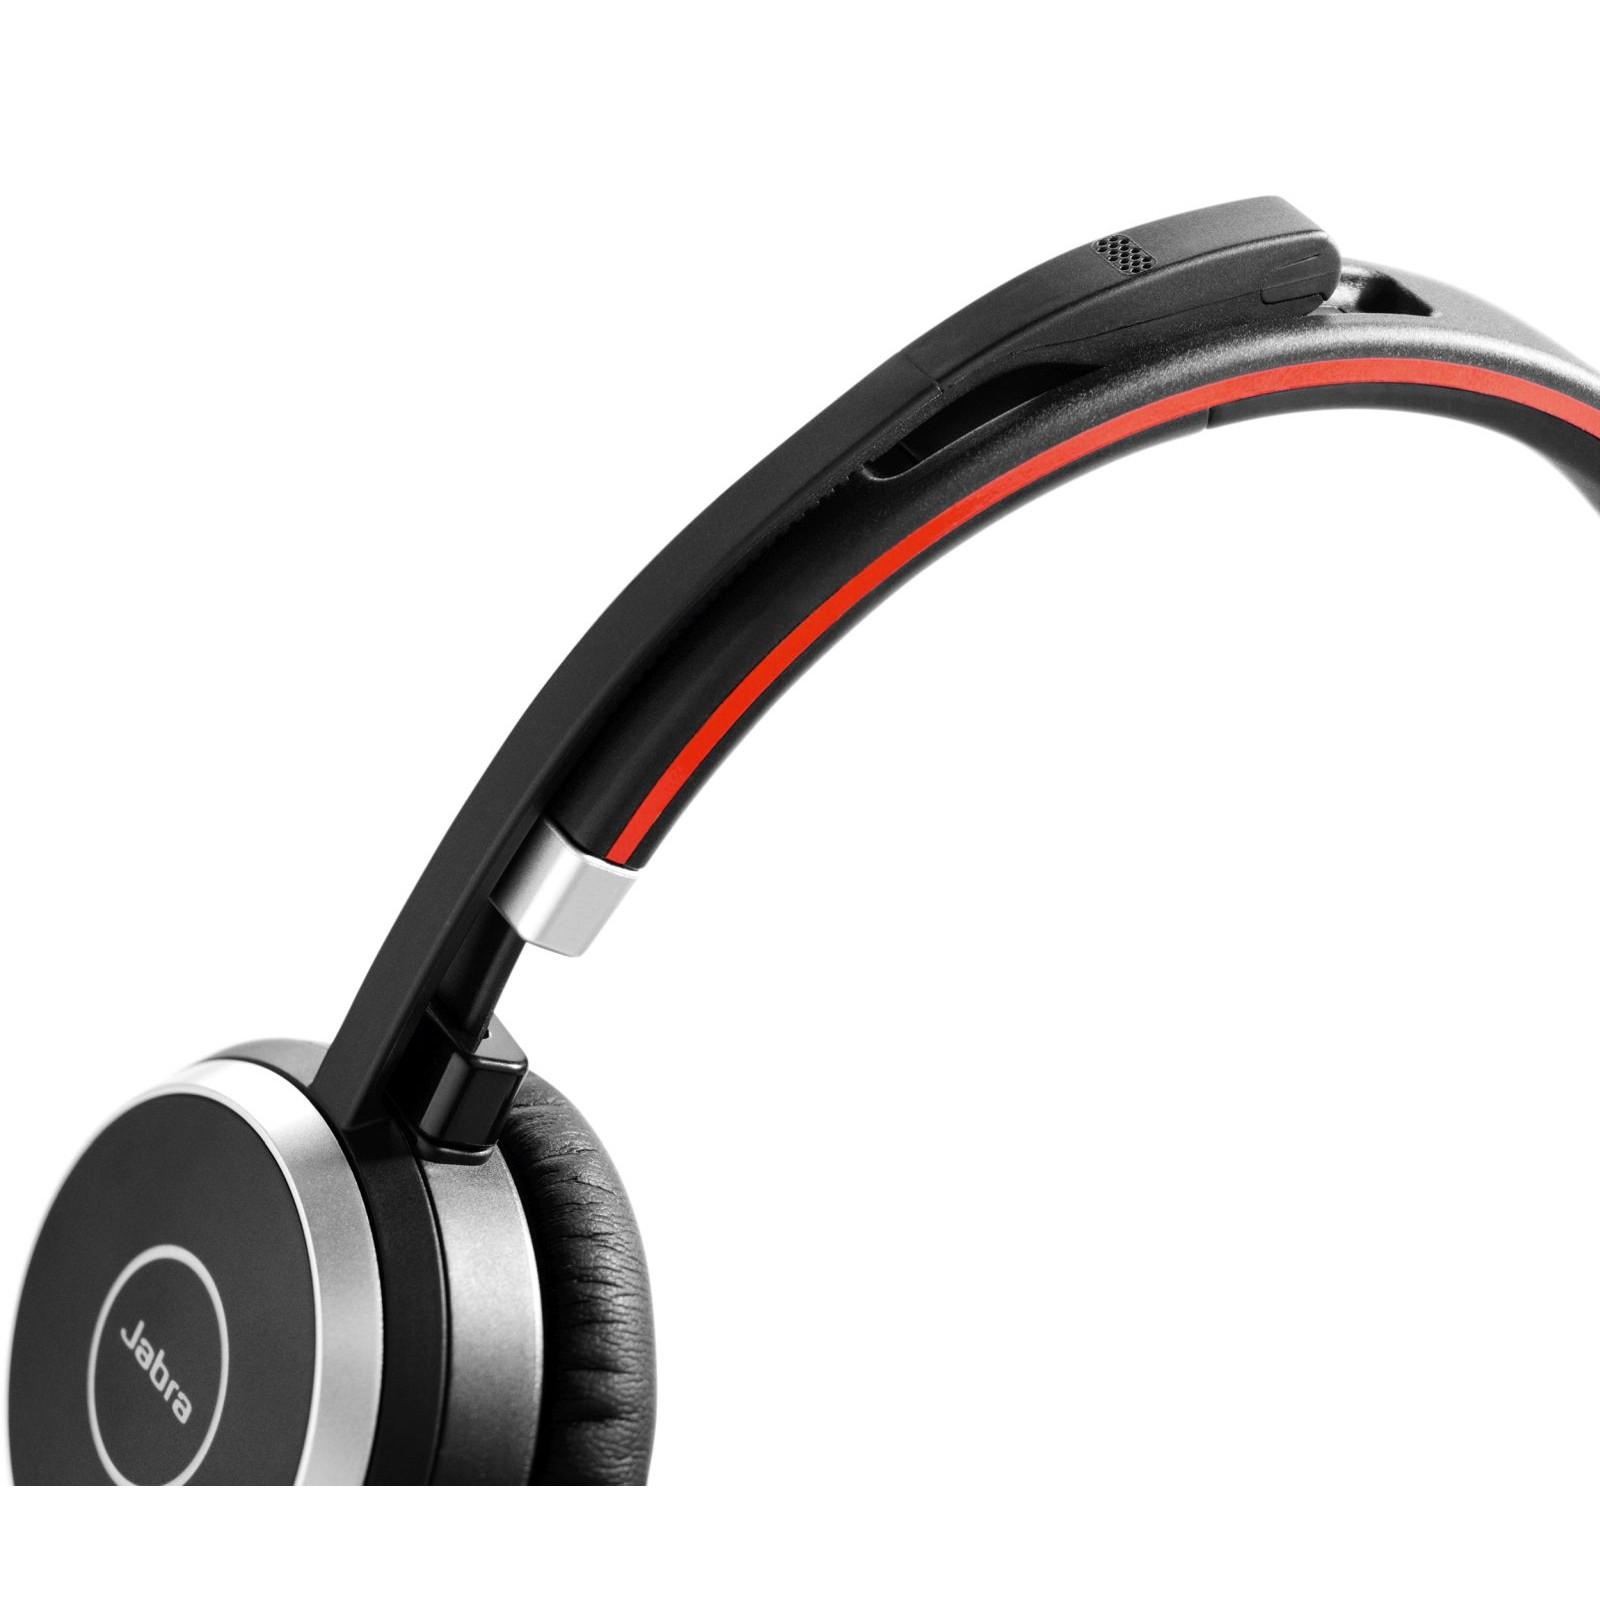 Jabra Evolve 40 Headset Design